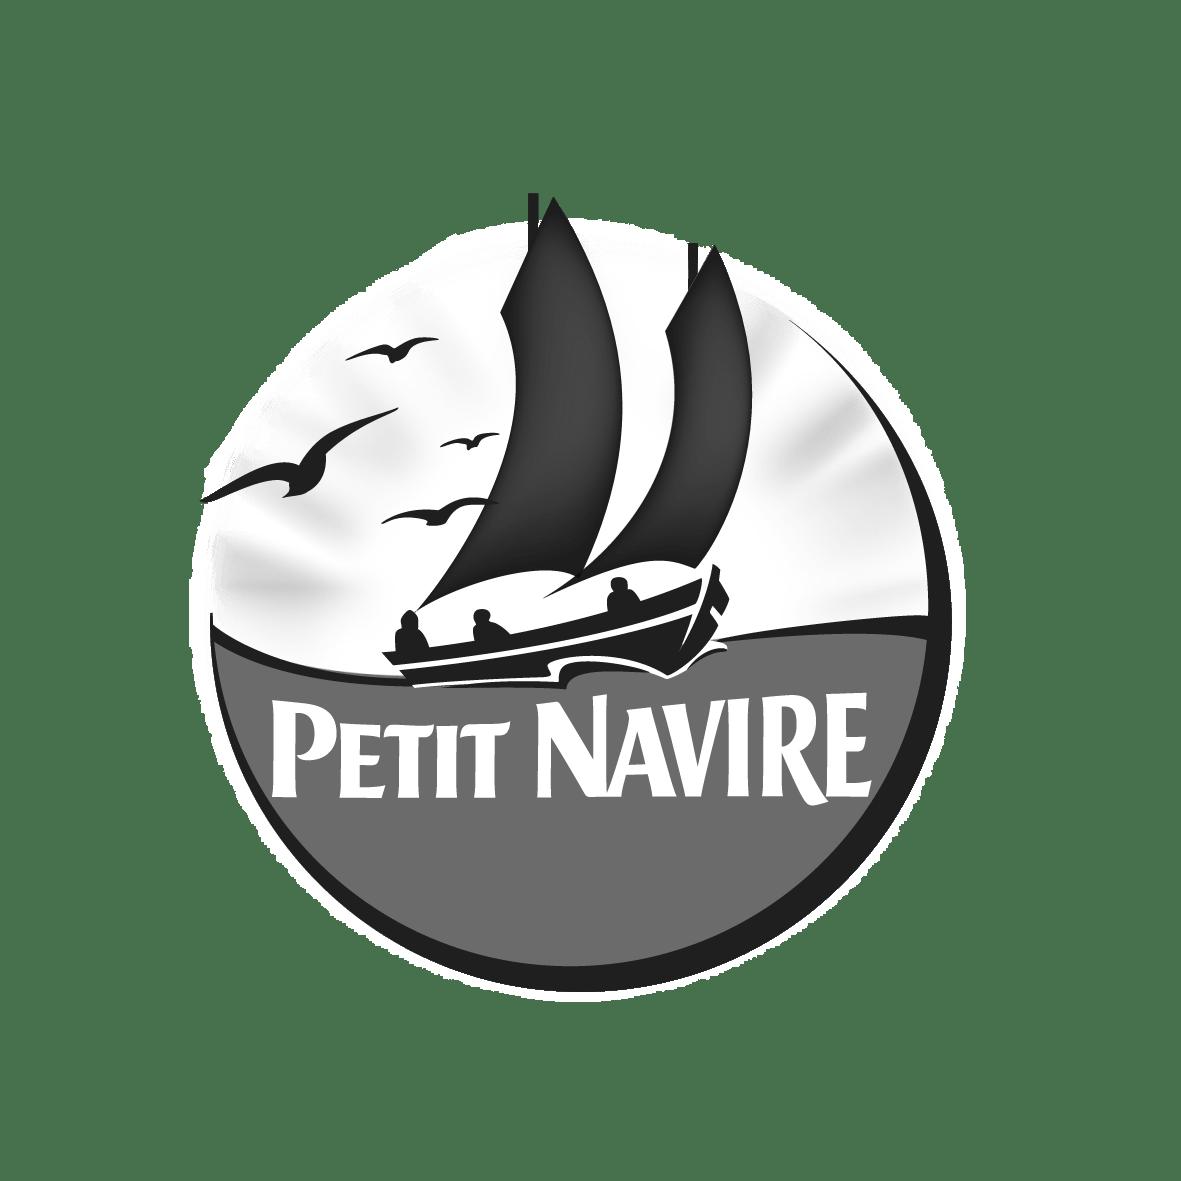 Agence branding pack design Paris - Pulp design - Petit Navire